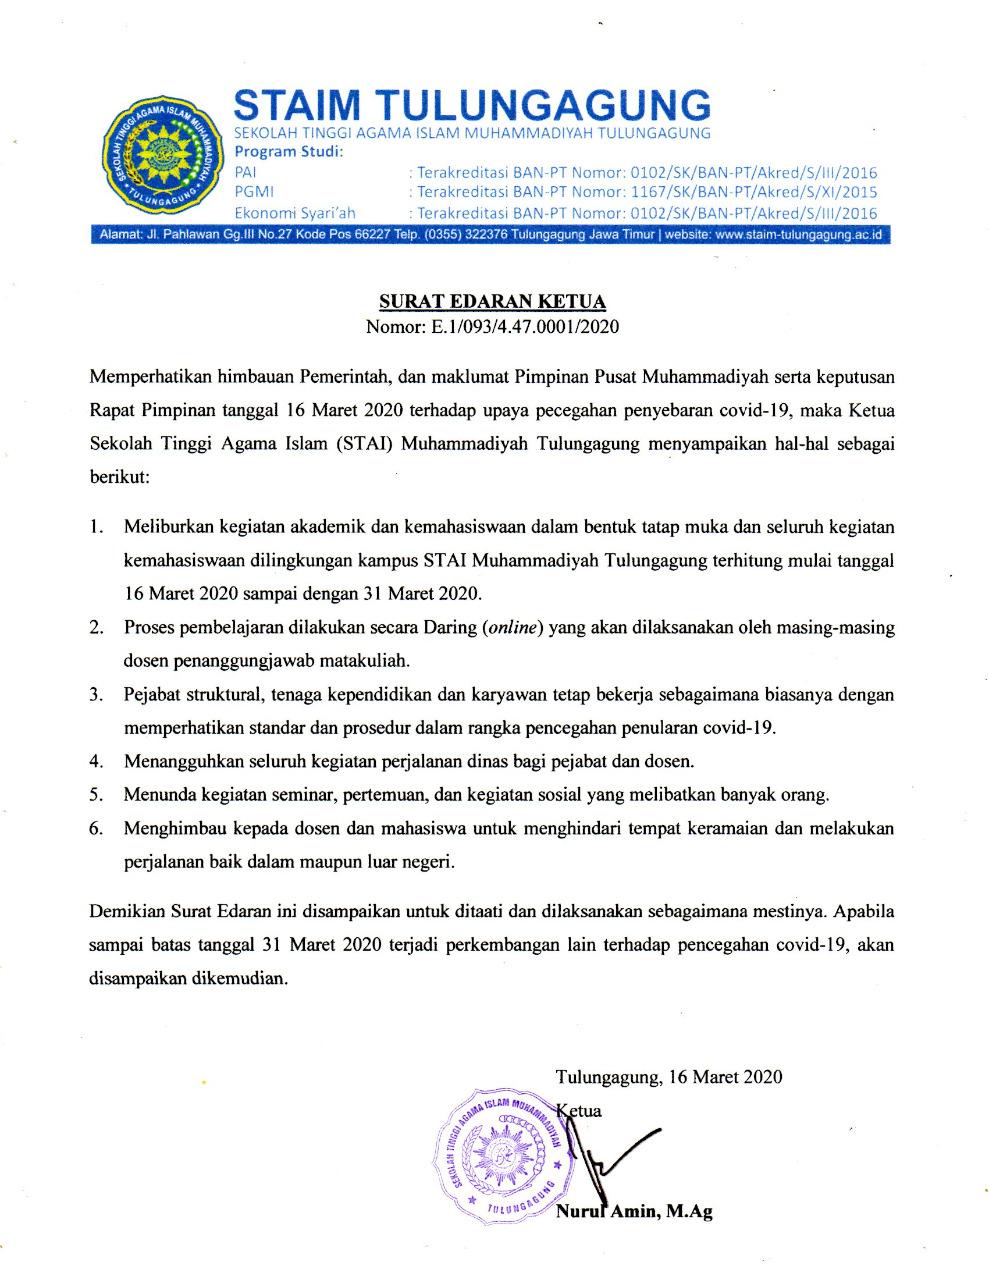 Surat Edaran Ketua Tentang Pencegahan Penyebaran Virus Corona di Lingkungan STAIM Tulungagung